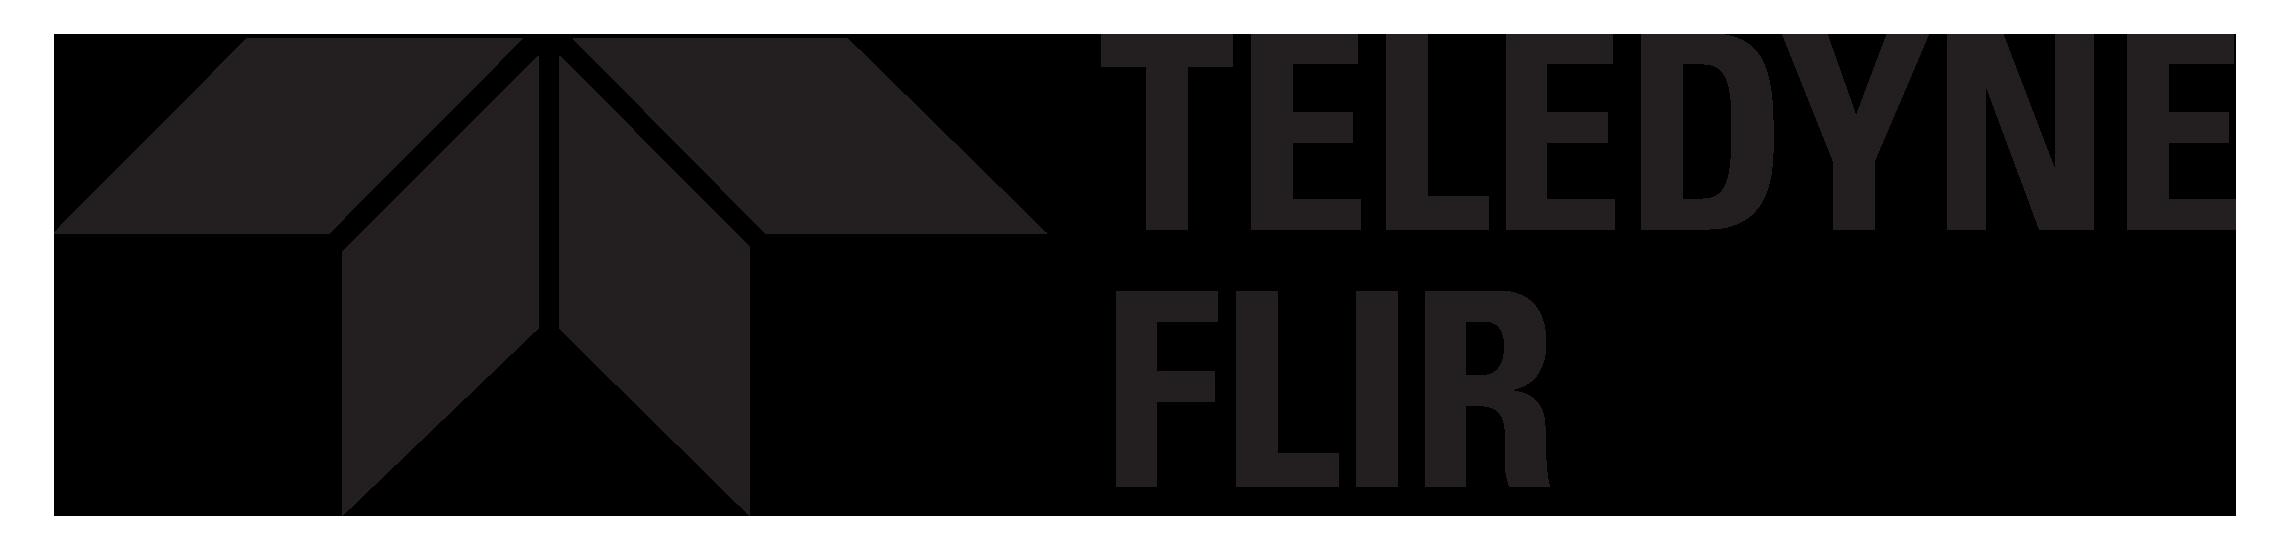 Teledyne FLIR_2 Line Logo_Black_without Everywhere Tagline